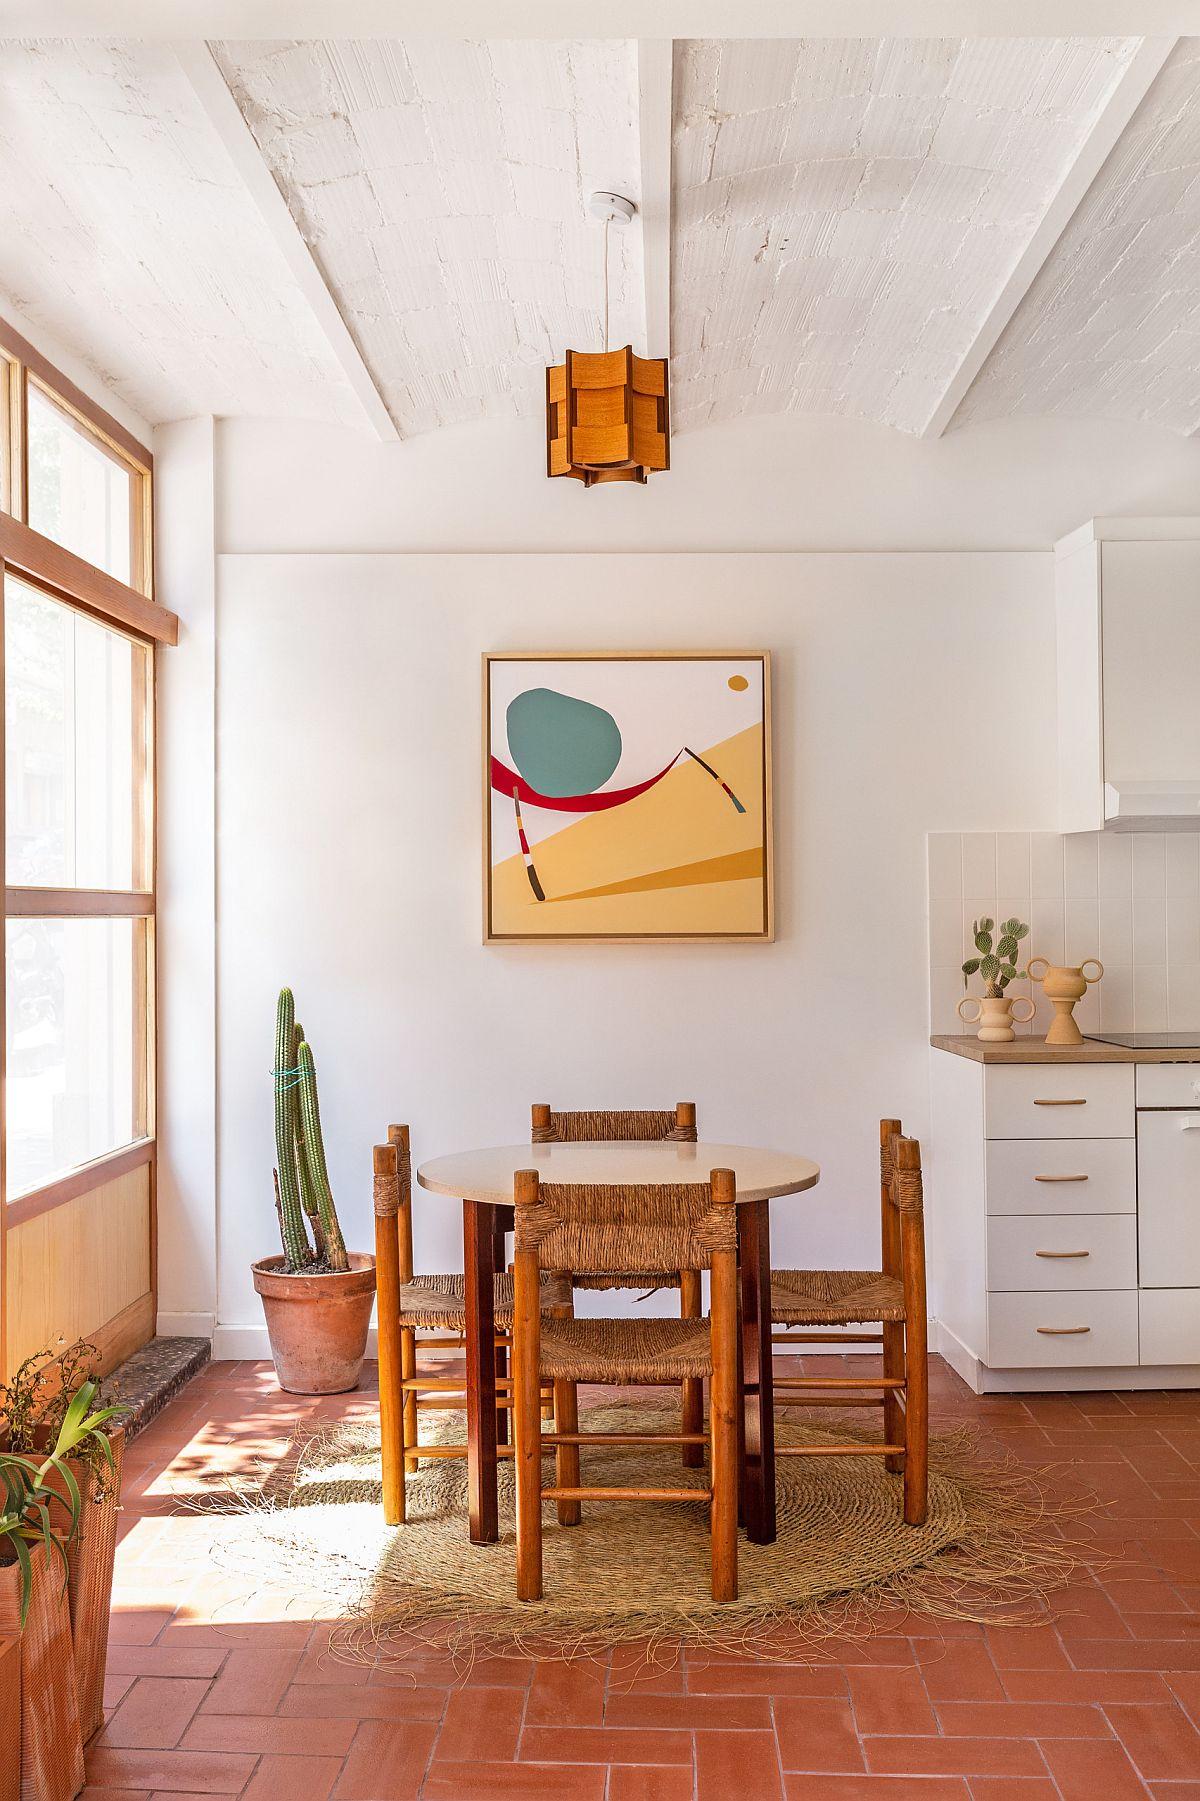 Delightful-little-dining-room-with-terracotta-floor-tiles-veers-more-towards-modern-than-Mediterranean-60454